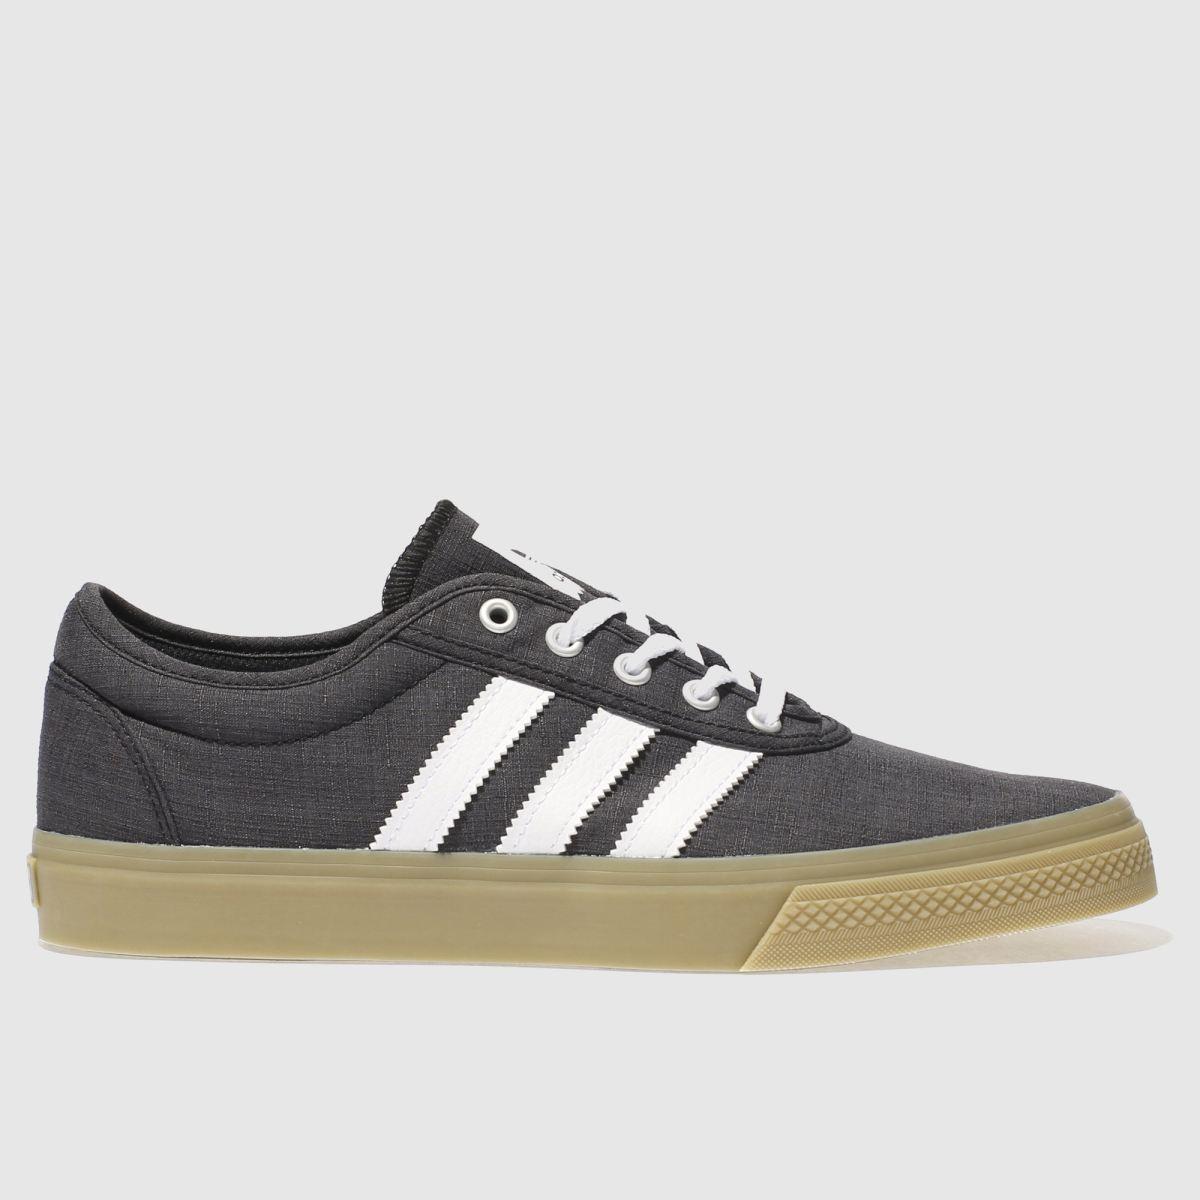 Adidas Skateboarding Black & White Adi-ease Trainers